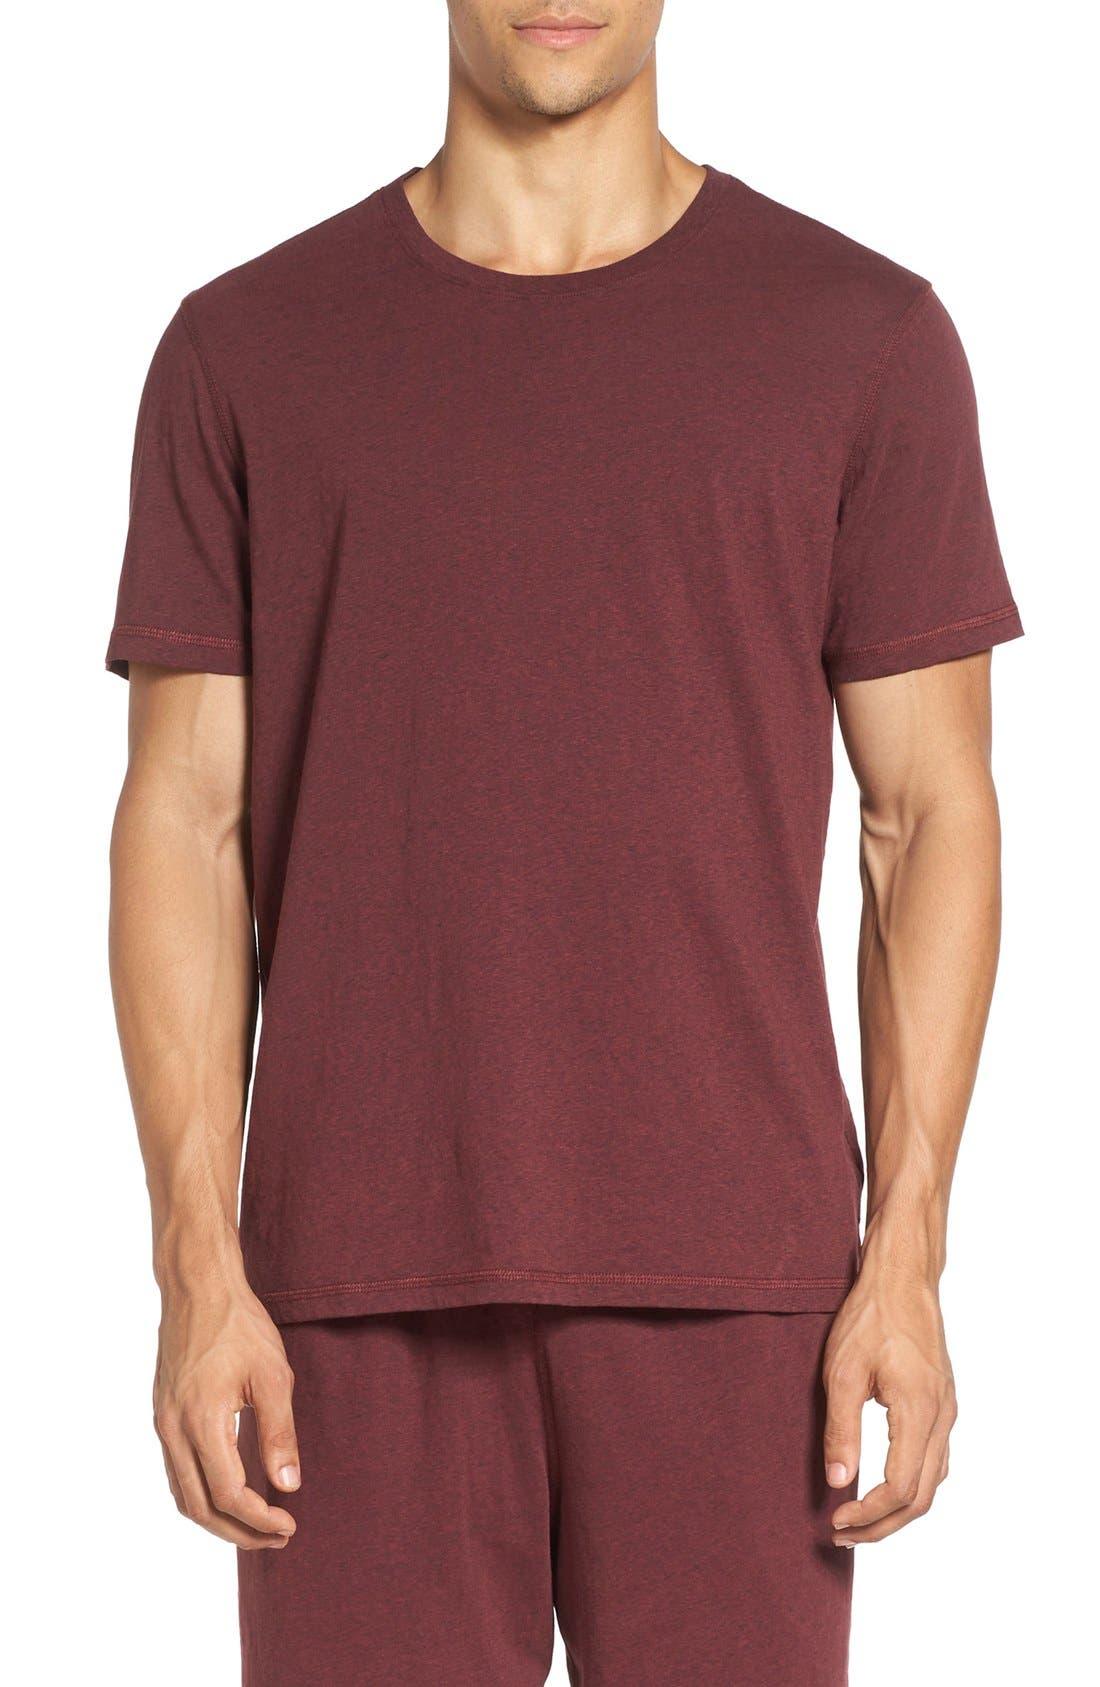 Alternate Image 1 Selected - Daniel Buchler Recycled Cotton Blend T-Shirt